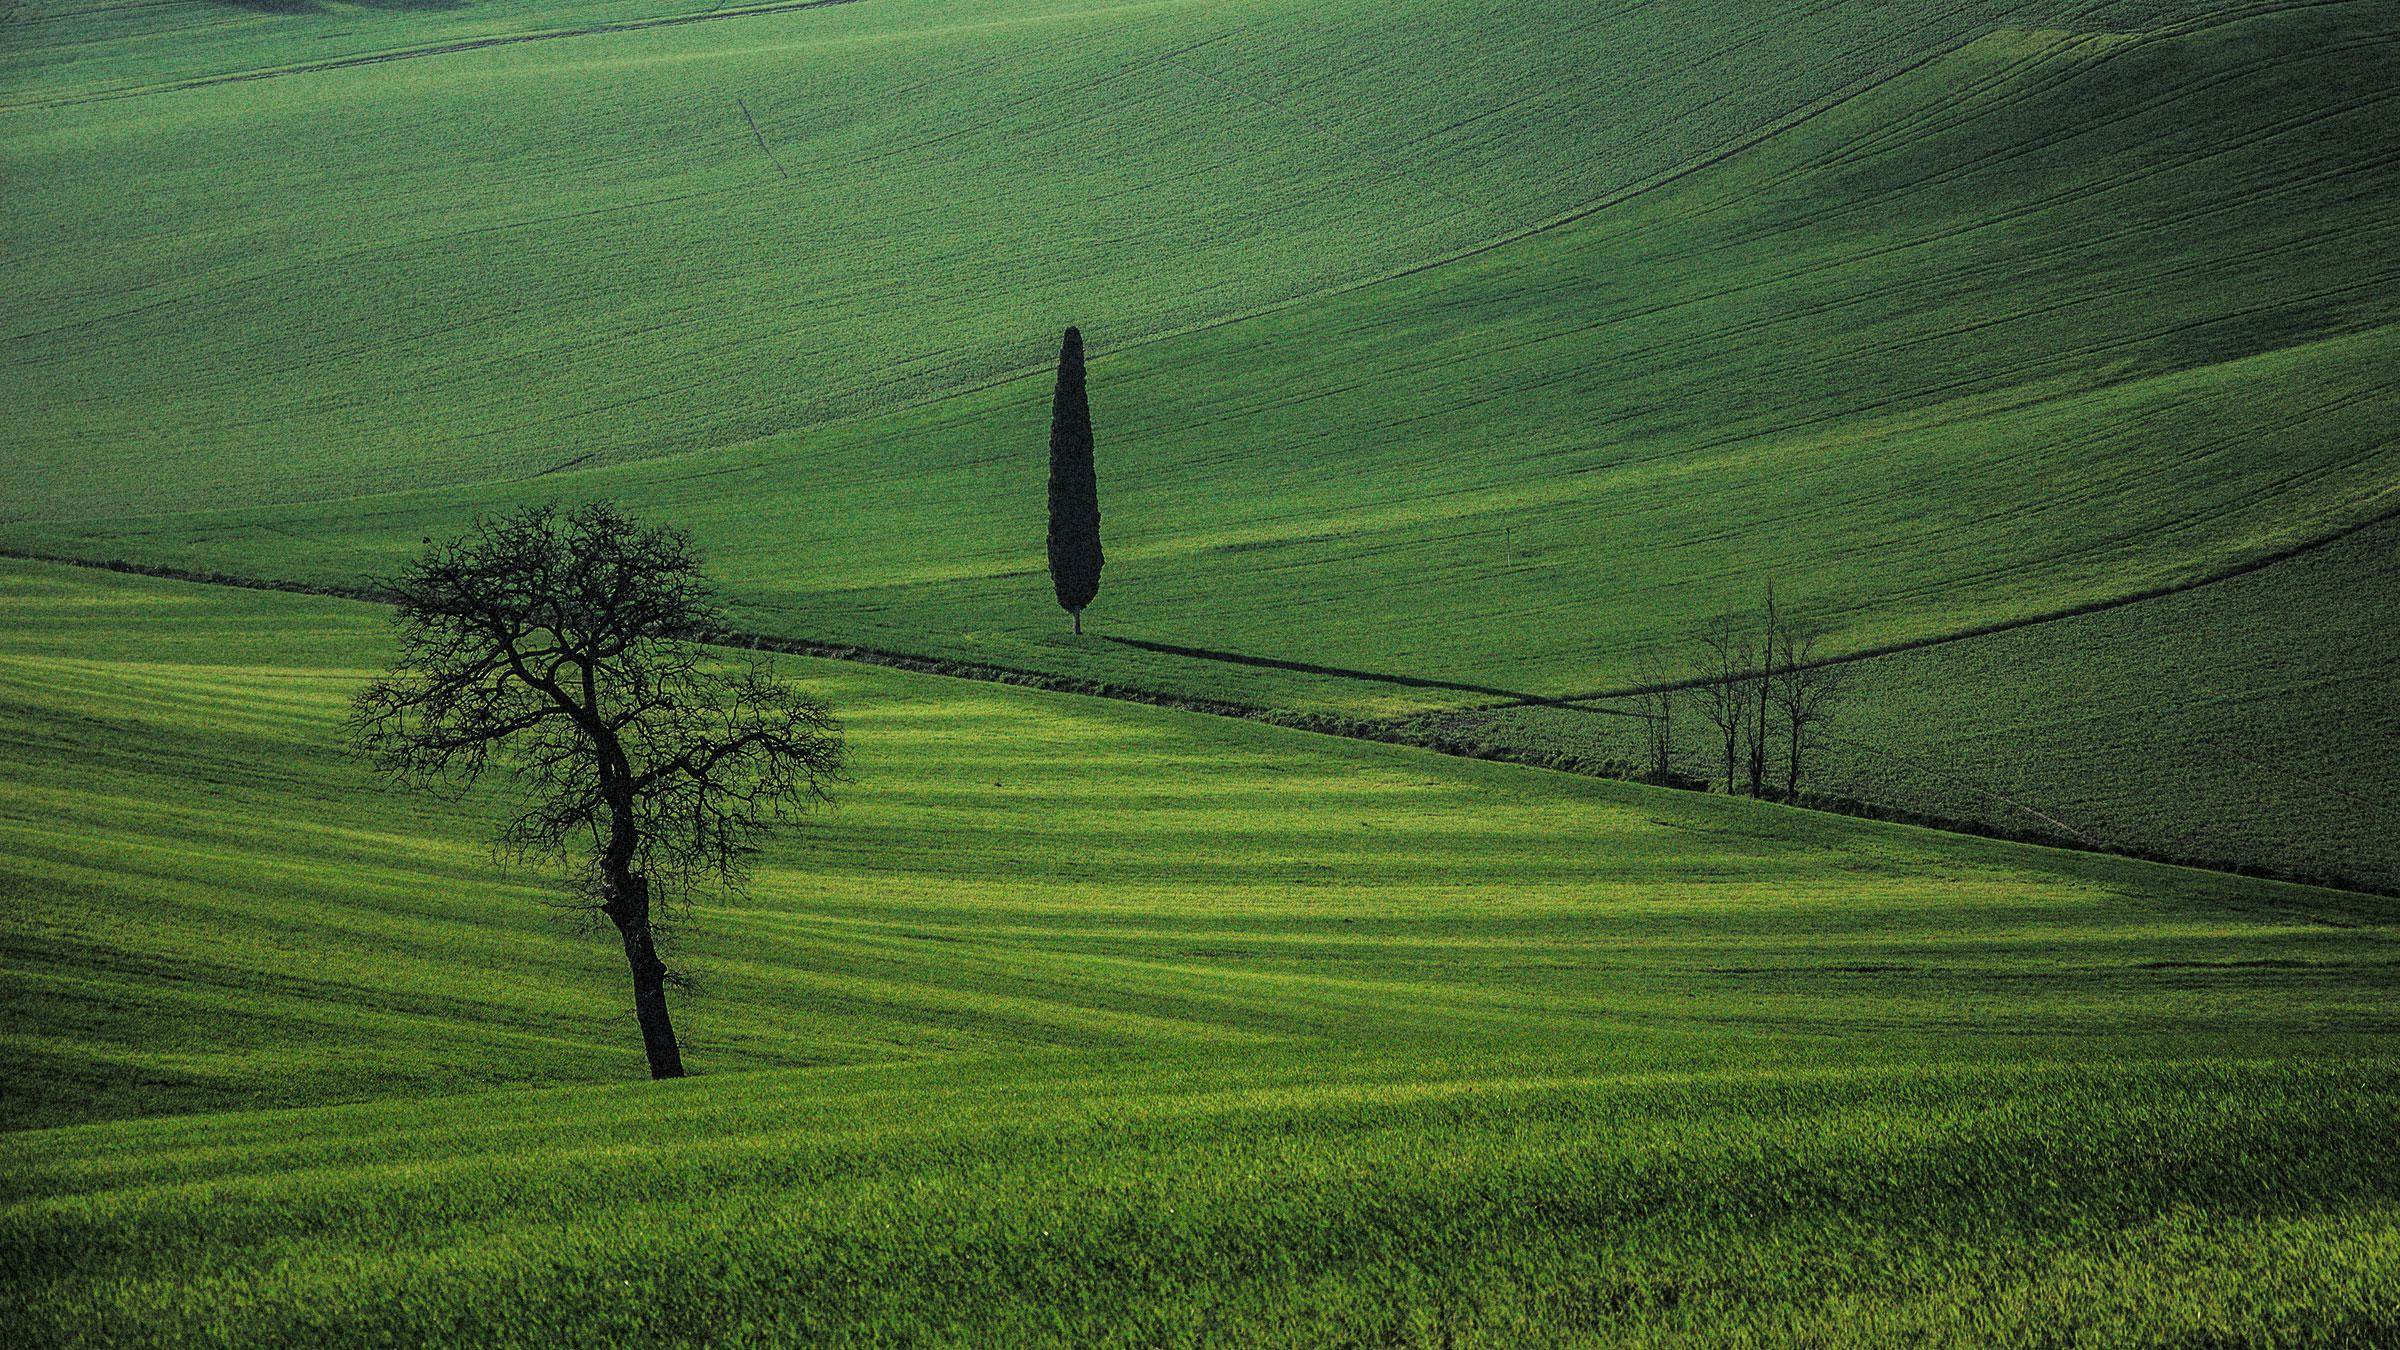 Nature and surroundings